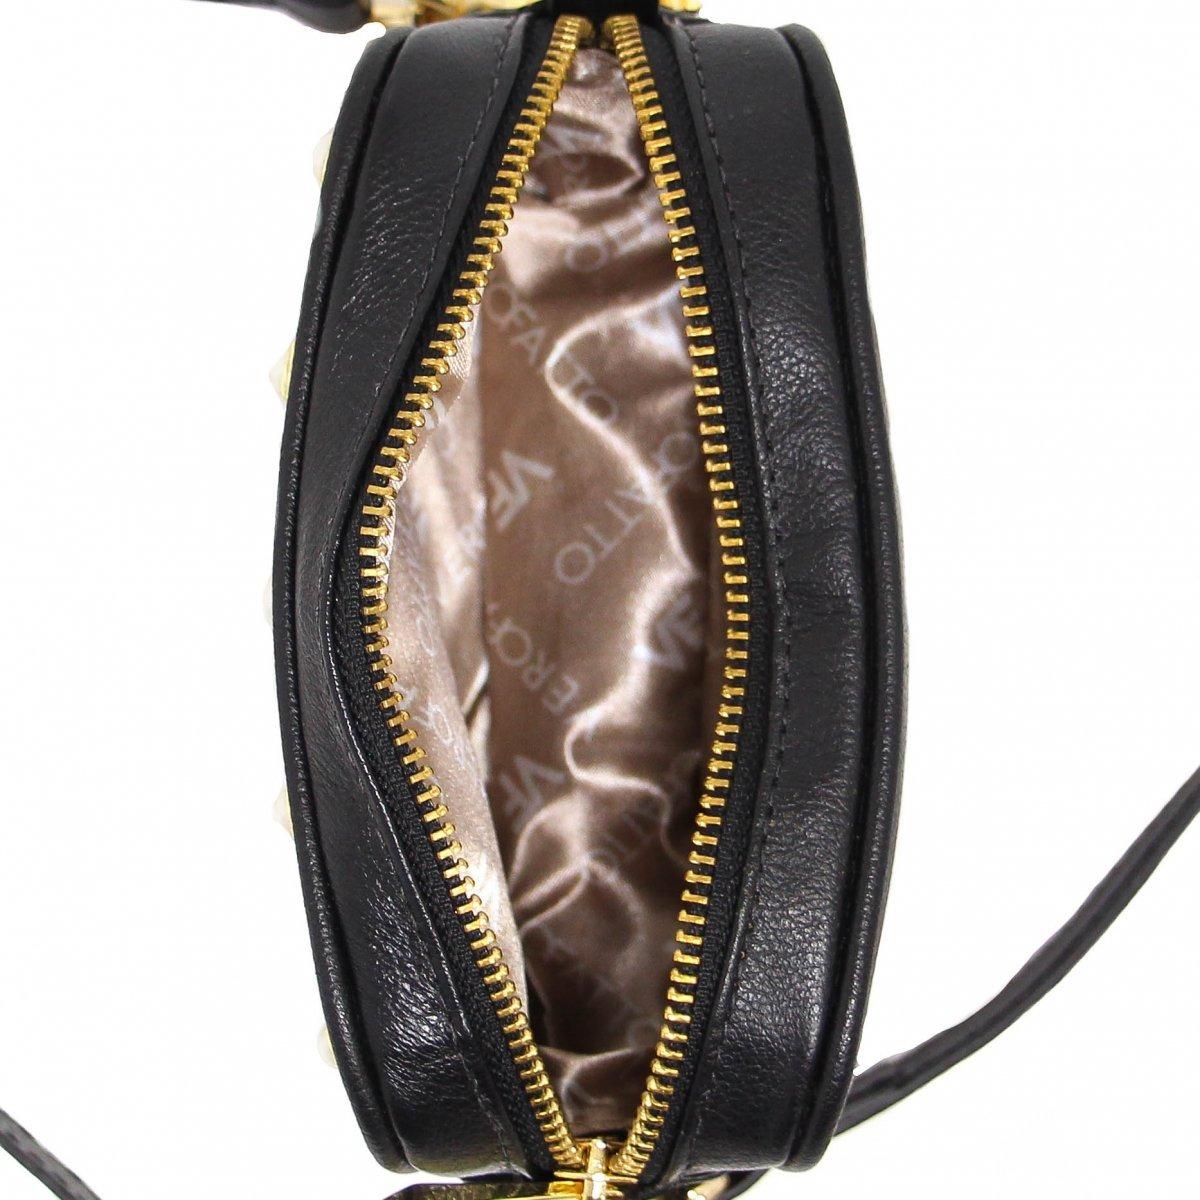 63b78f231 Bolsa Verofatto Casual Pedras Couro   Zariff - R$ 399,99 em Mercado ...